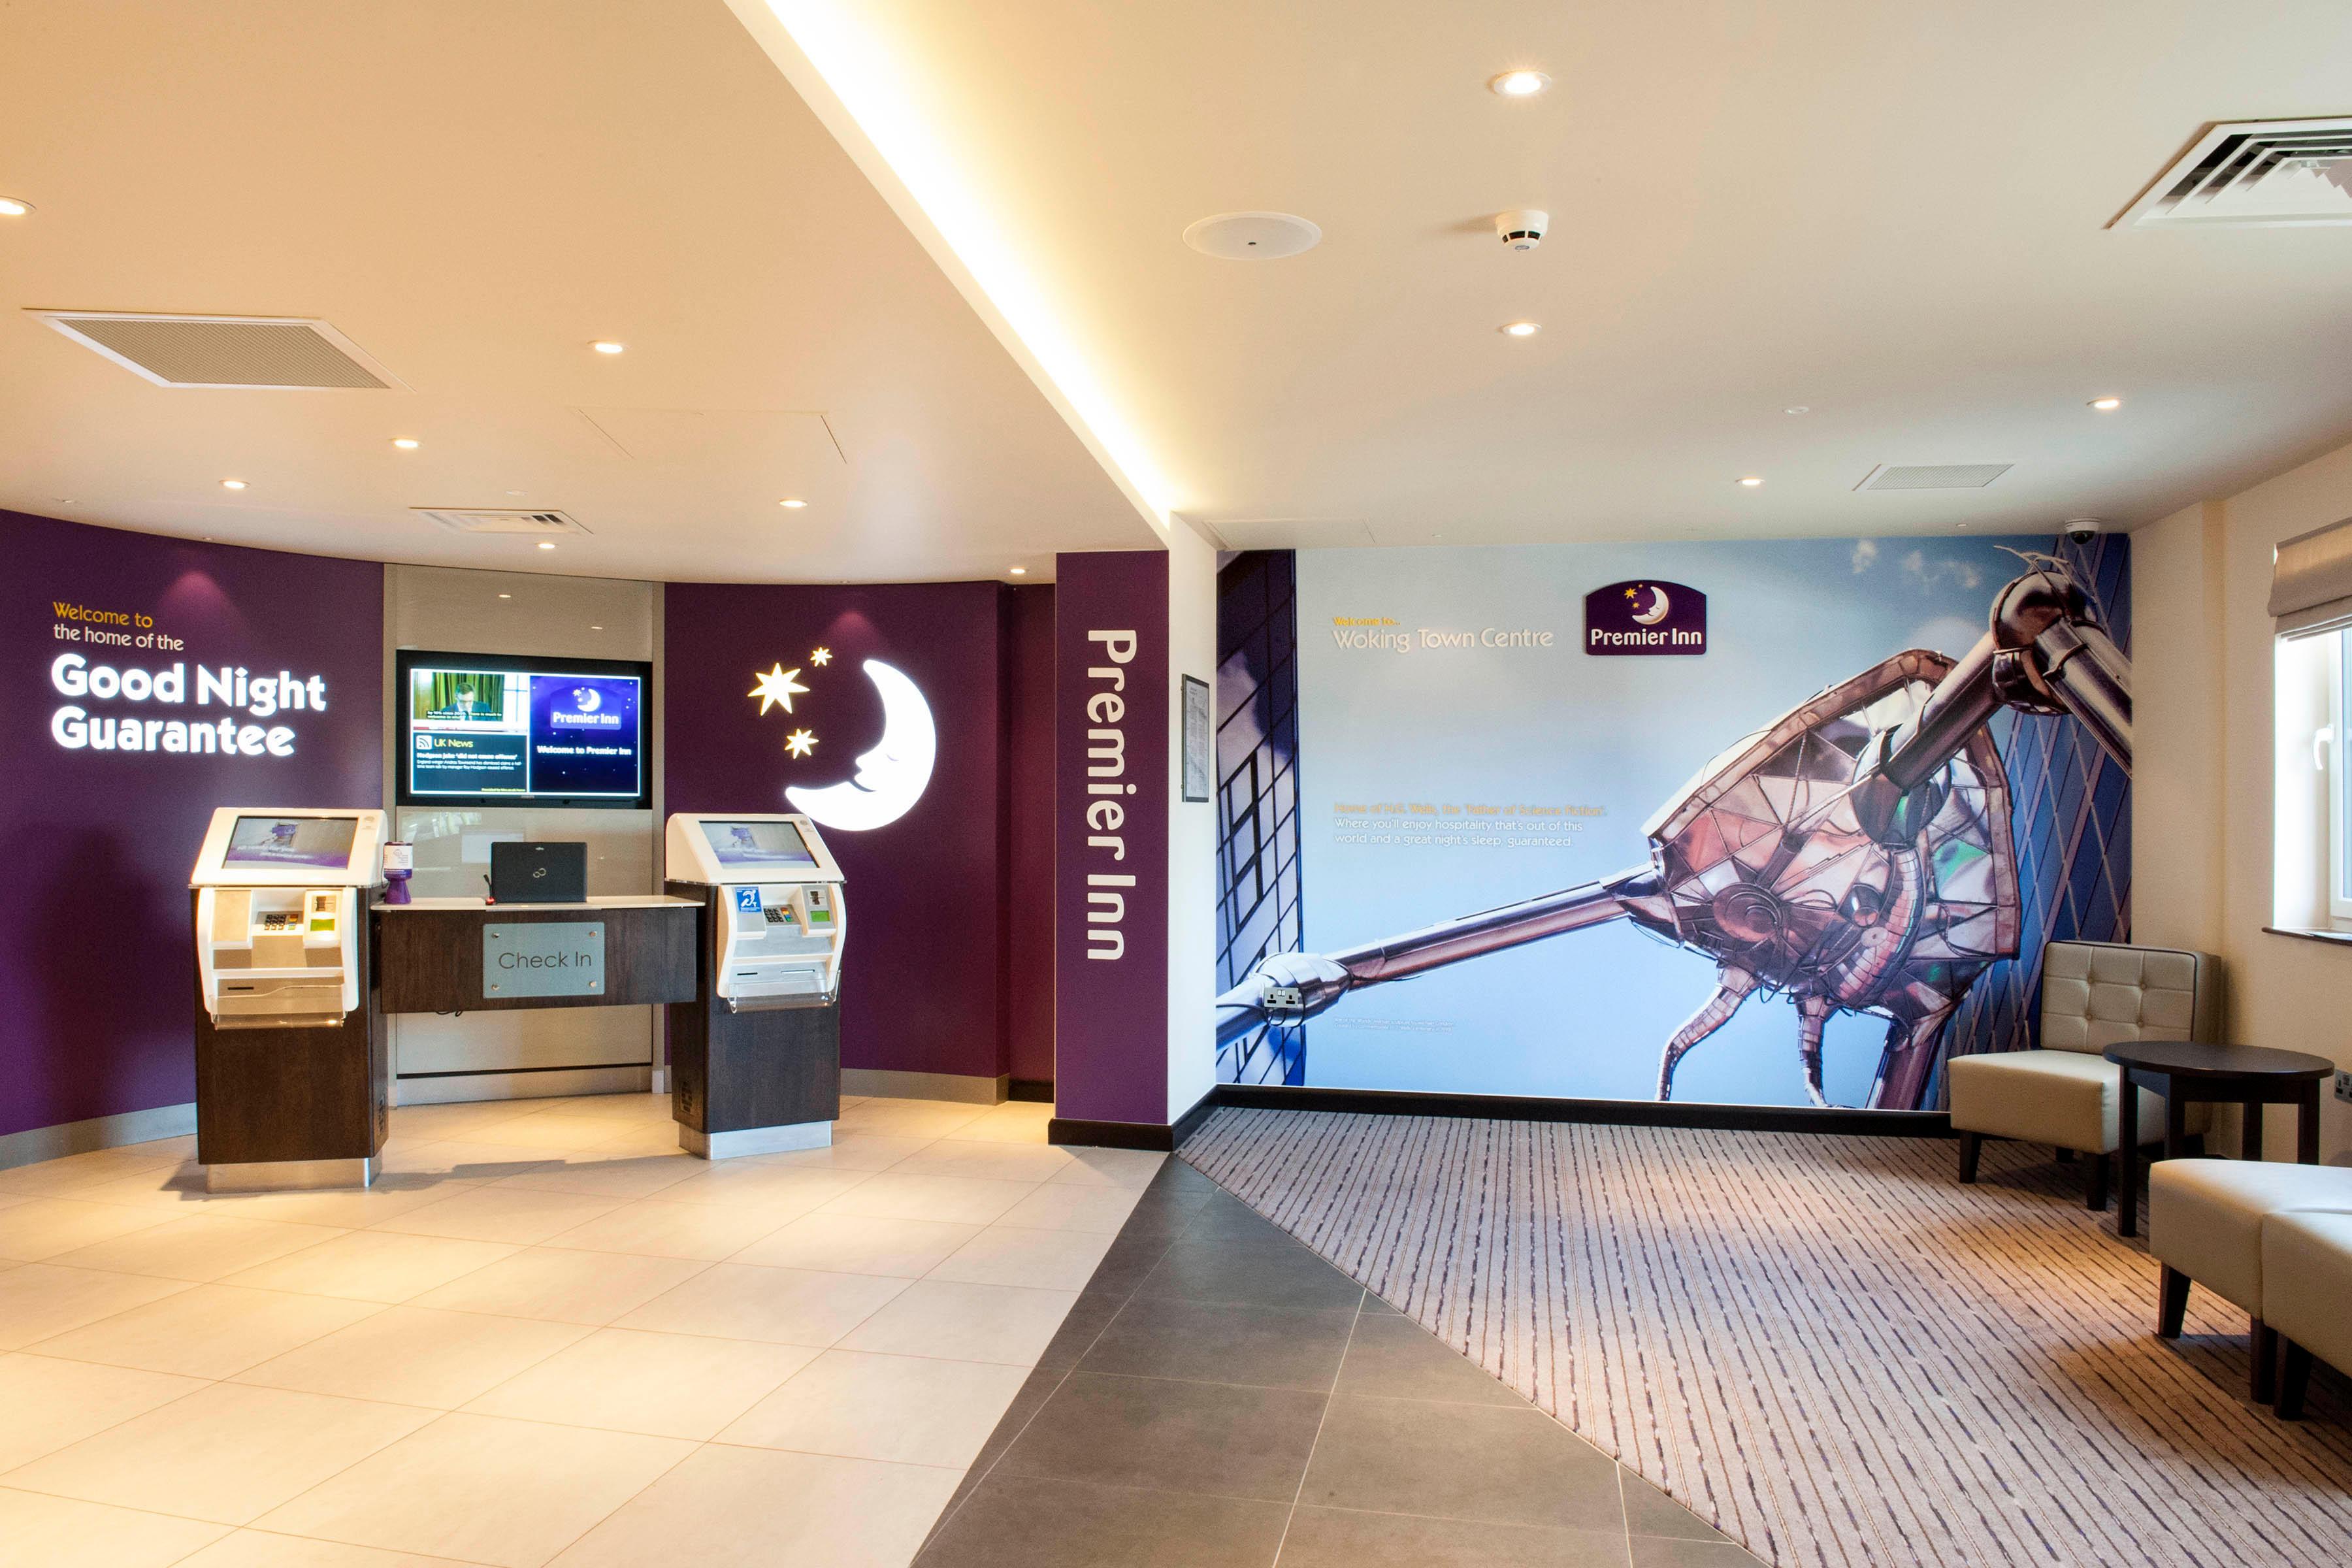 Premier Inn reception Premier Inn Woking Town Centre hotel Woking 03333 219329